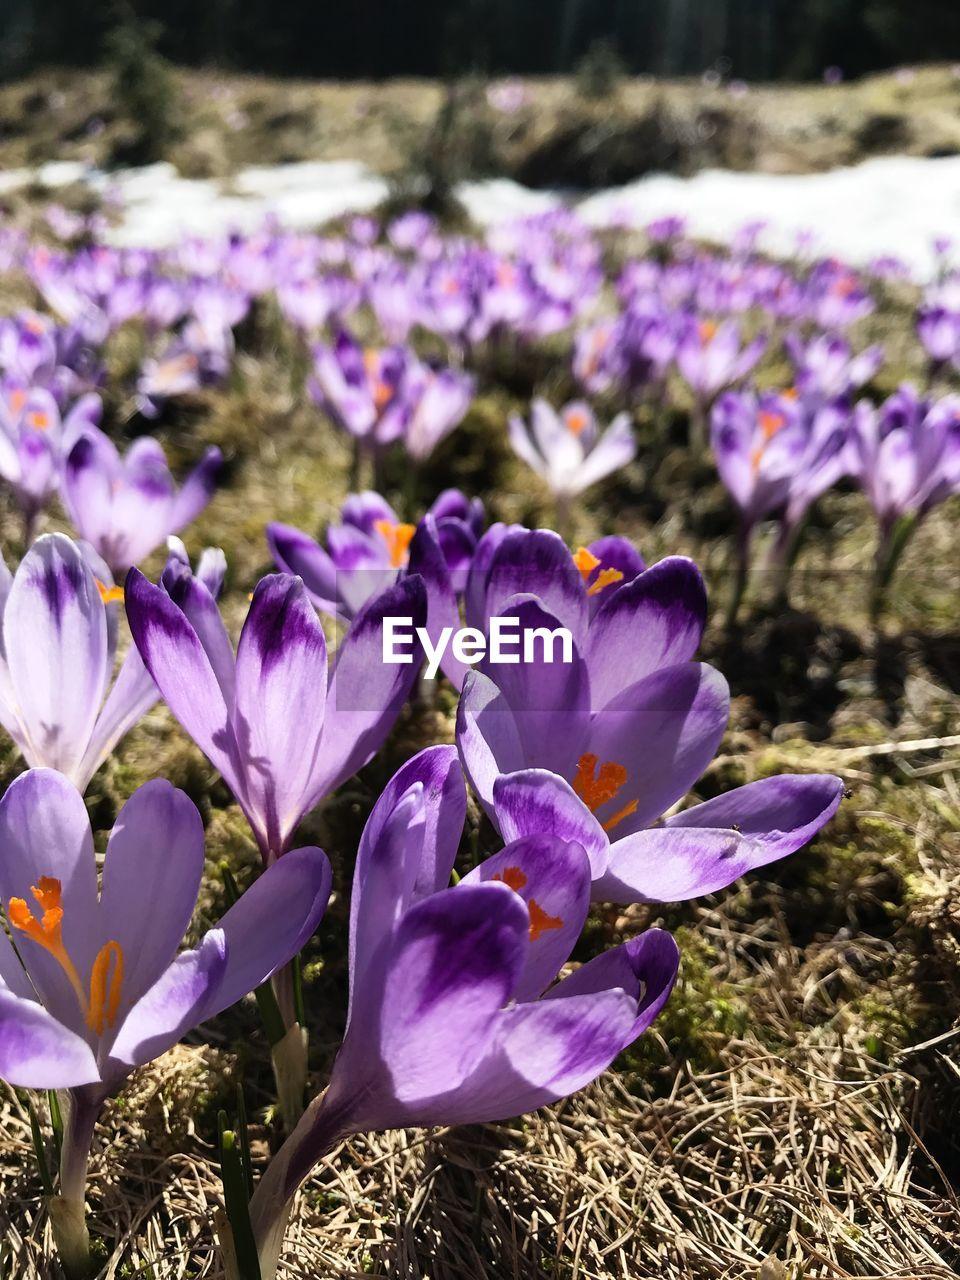 CLOSE-UP OF PURPLE CROCUS FLOWERS IN FIELD